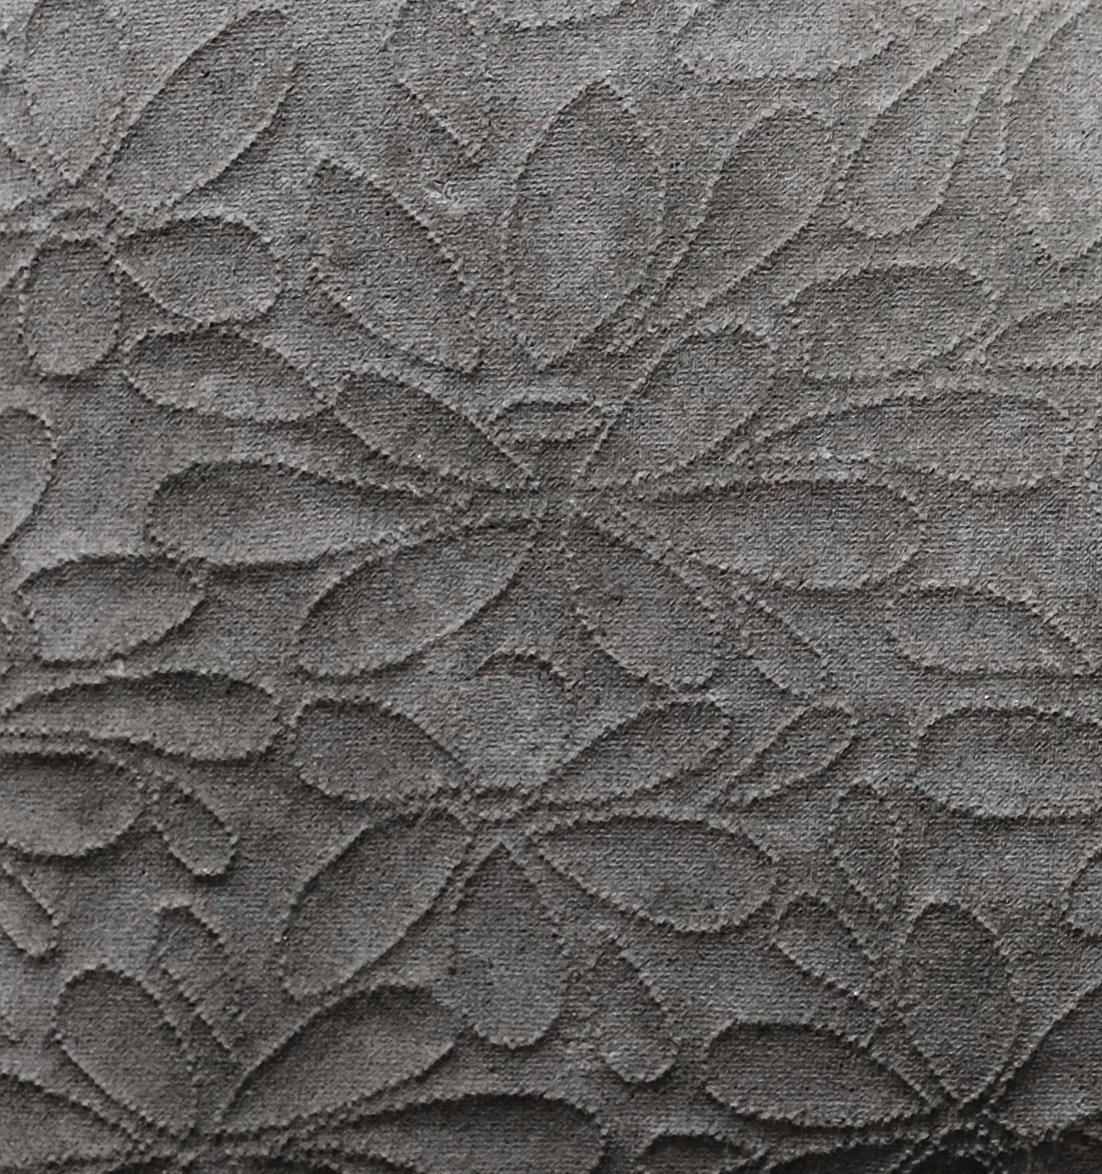 Formconcrete Muotobetoni Textures